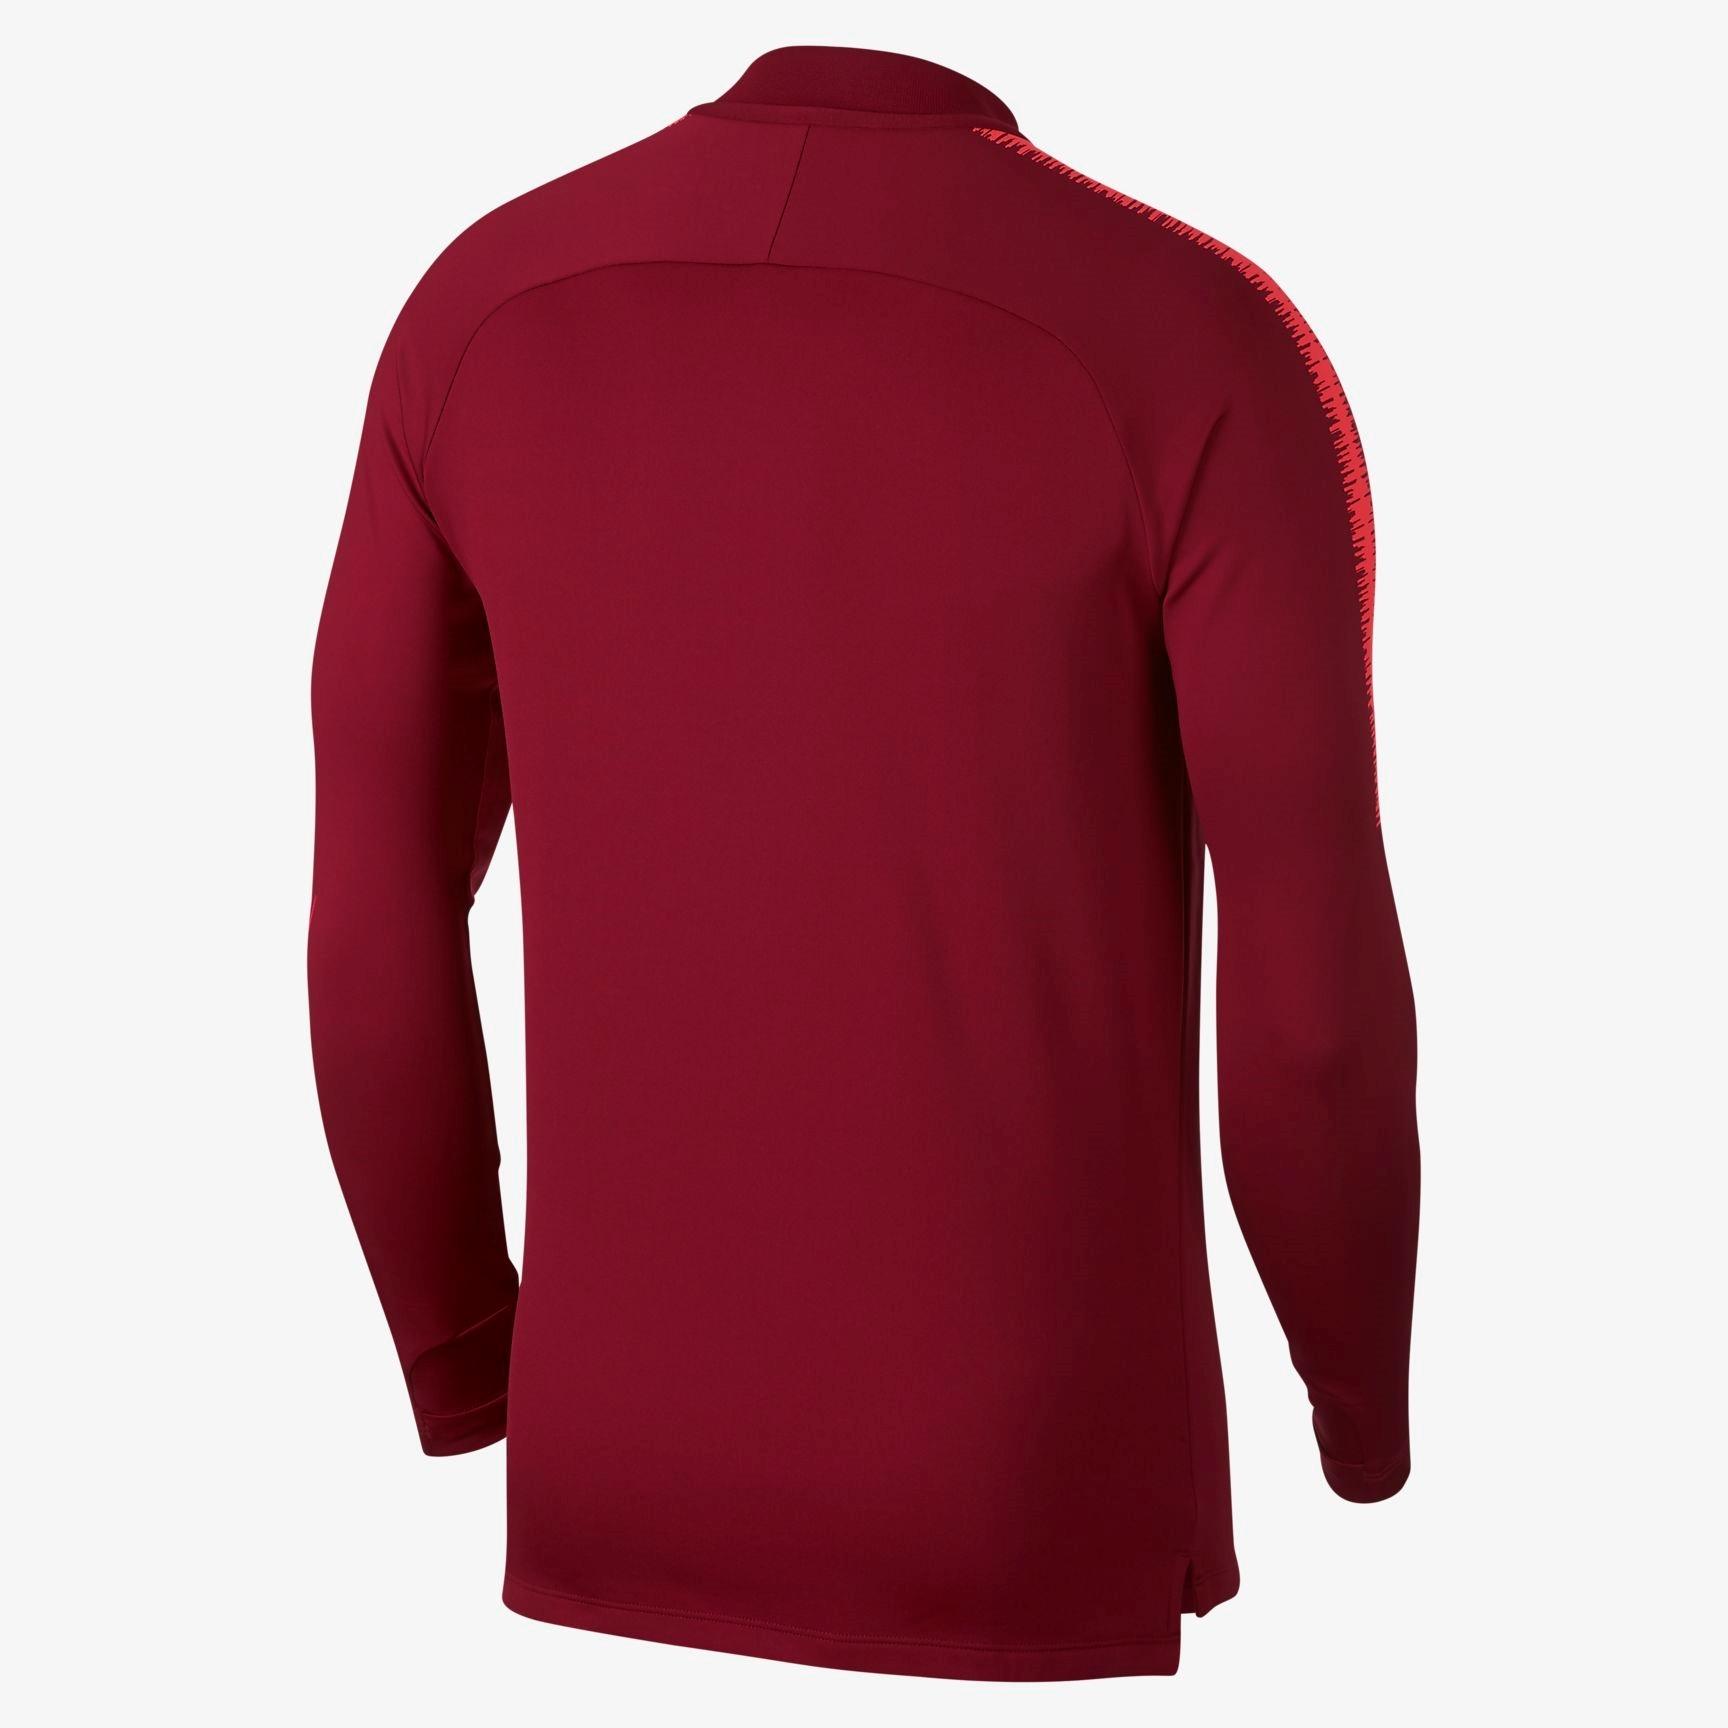 940b33da3d6 Nike M NK DRY SQD DRIL TOP 18 894631-677- Nava Sport - Vi selger ...